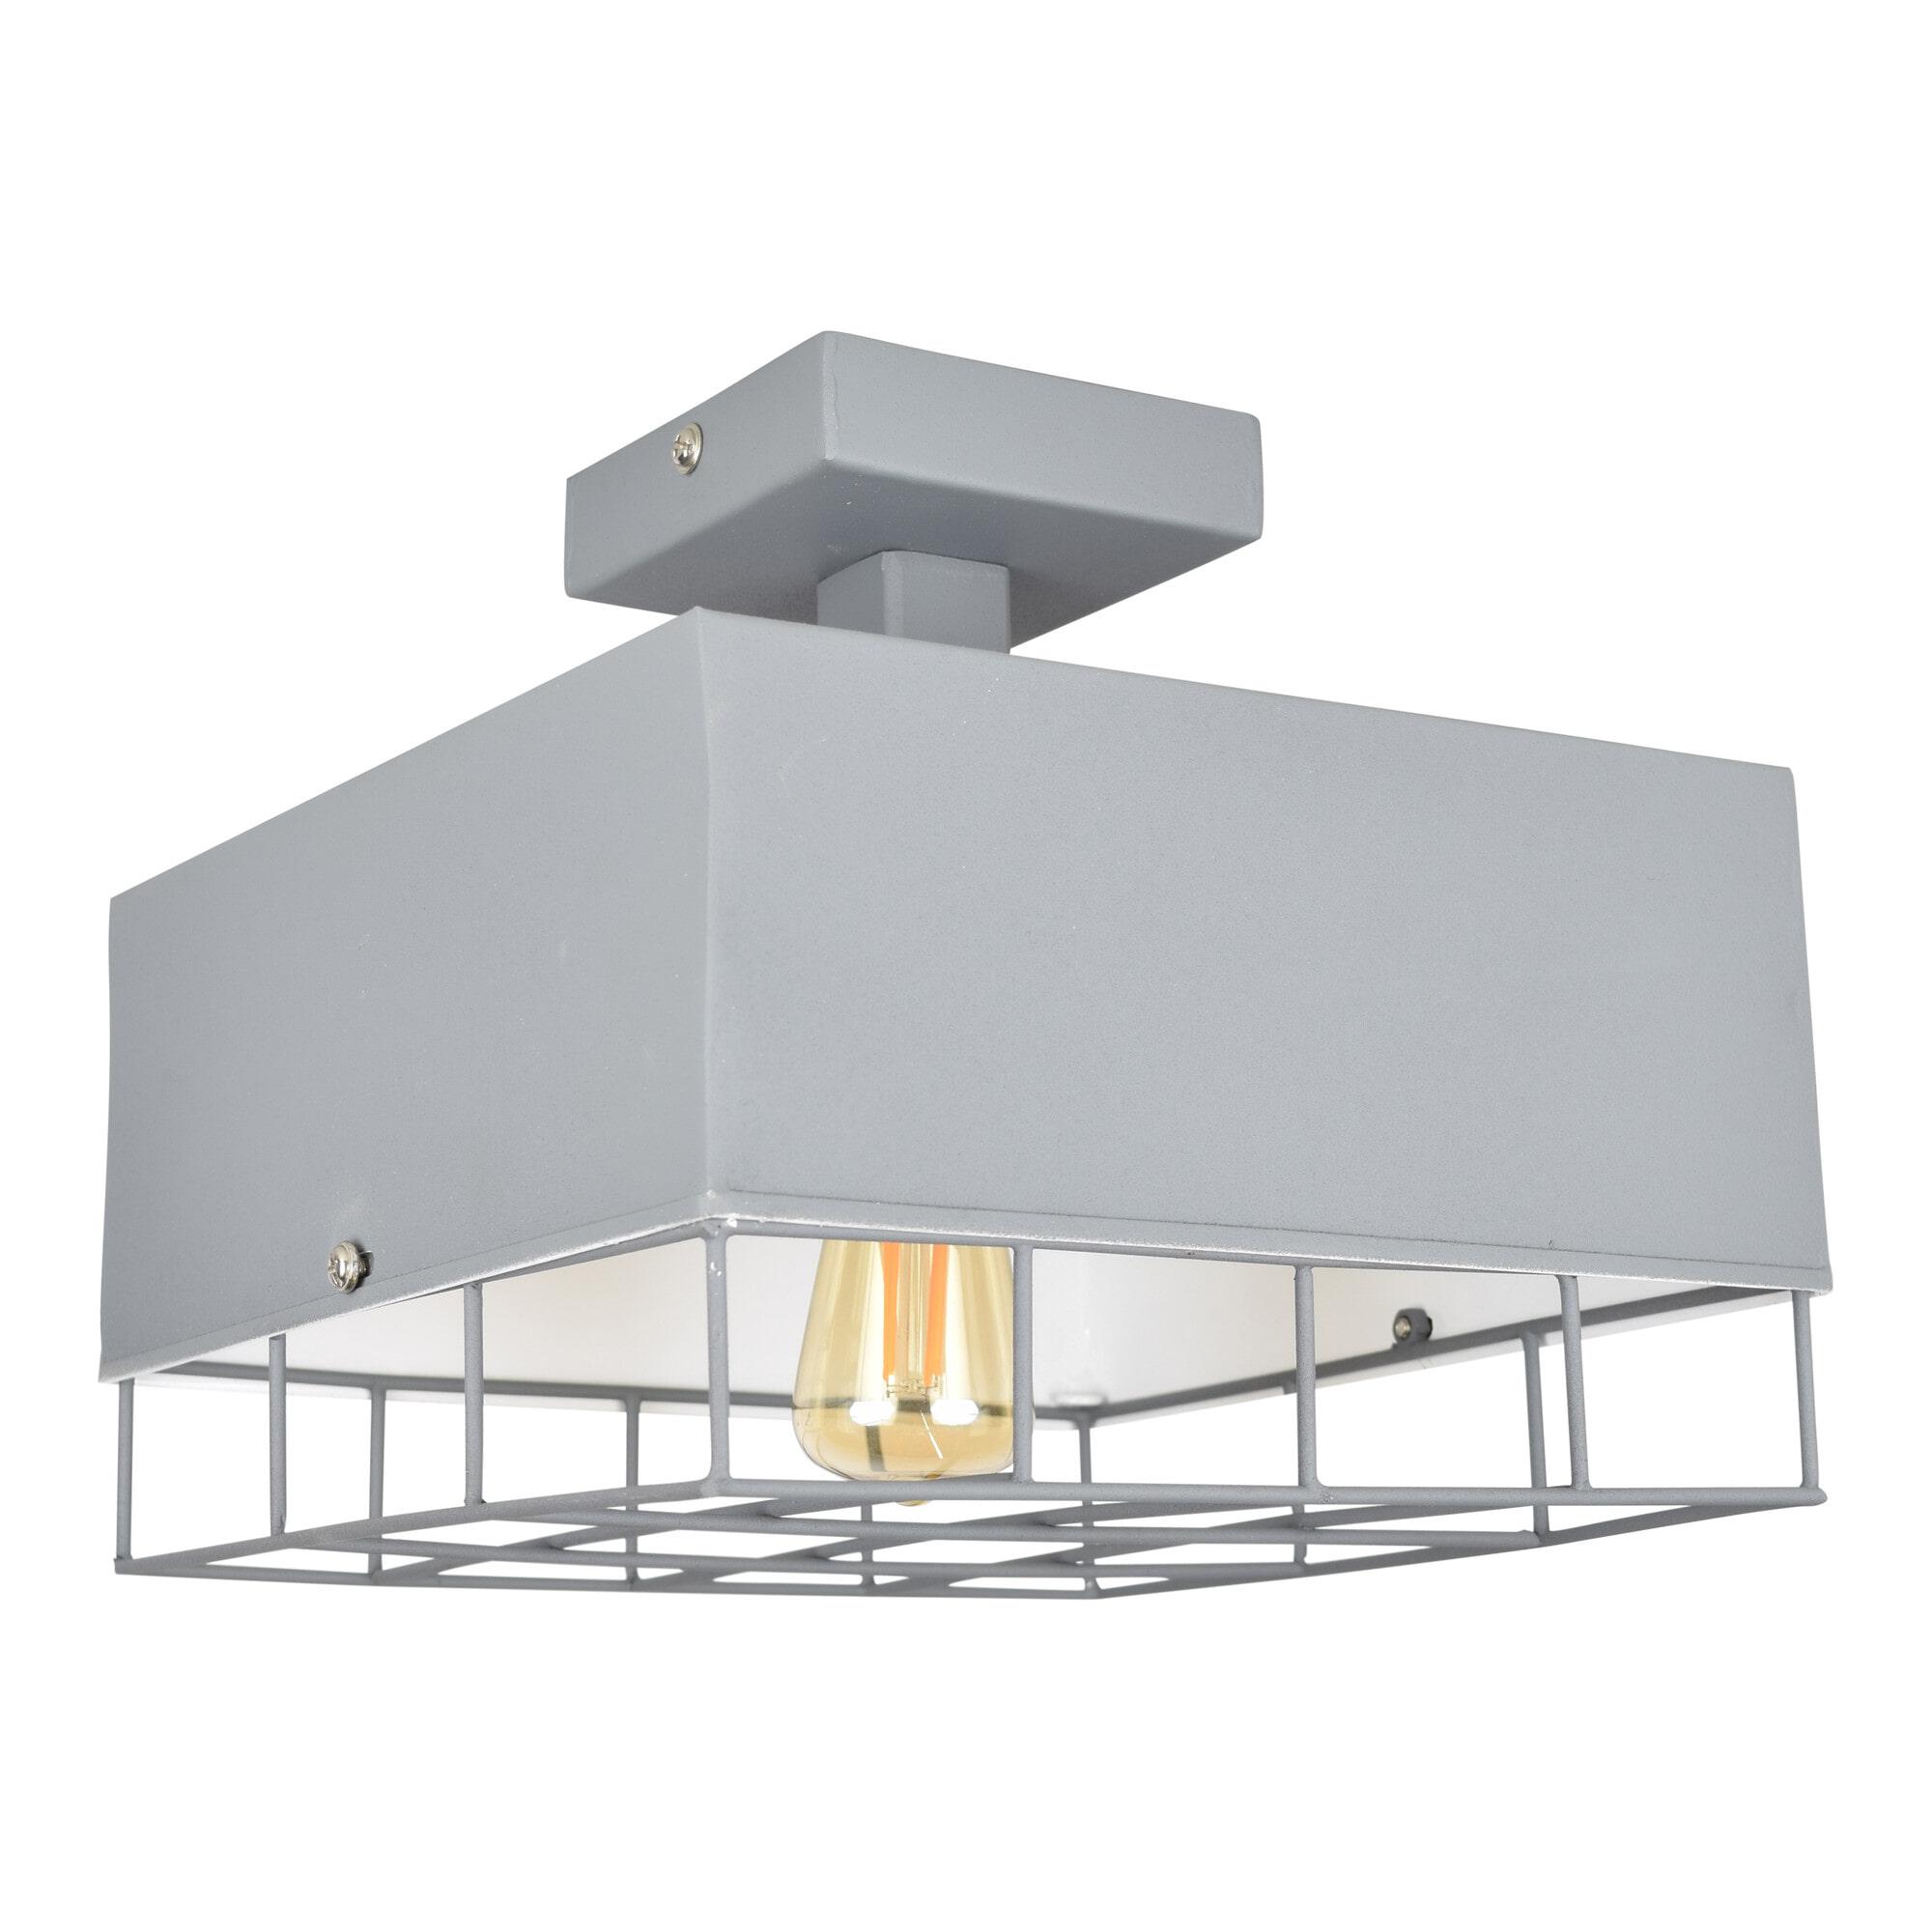 Urban Interiors plafondlamp 'Cage', kleur Vintage Grey